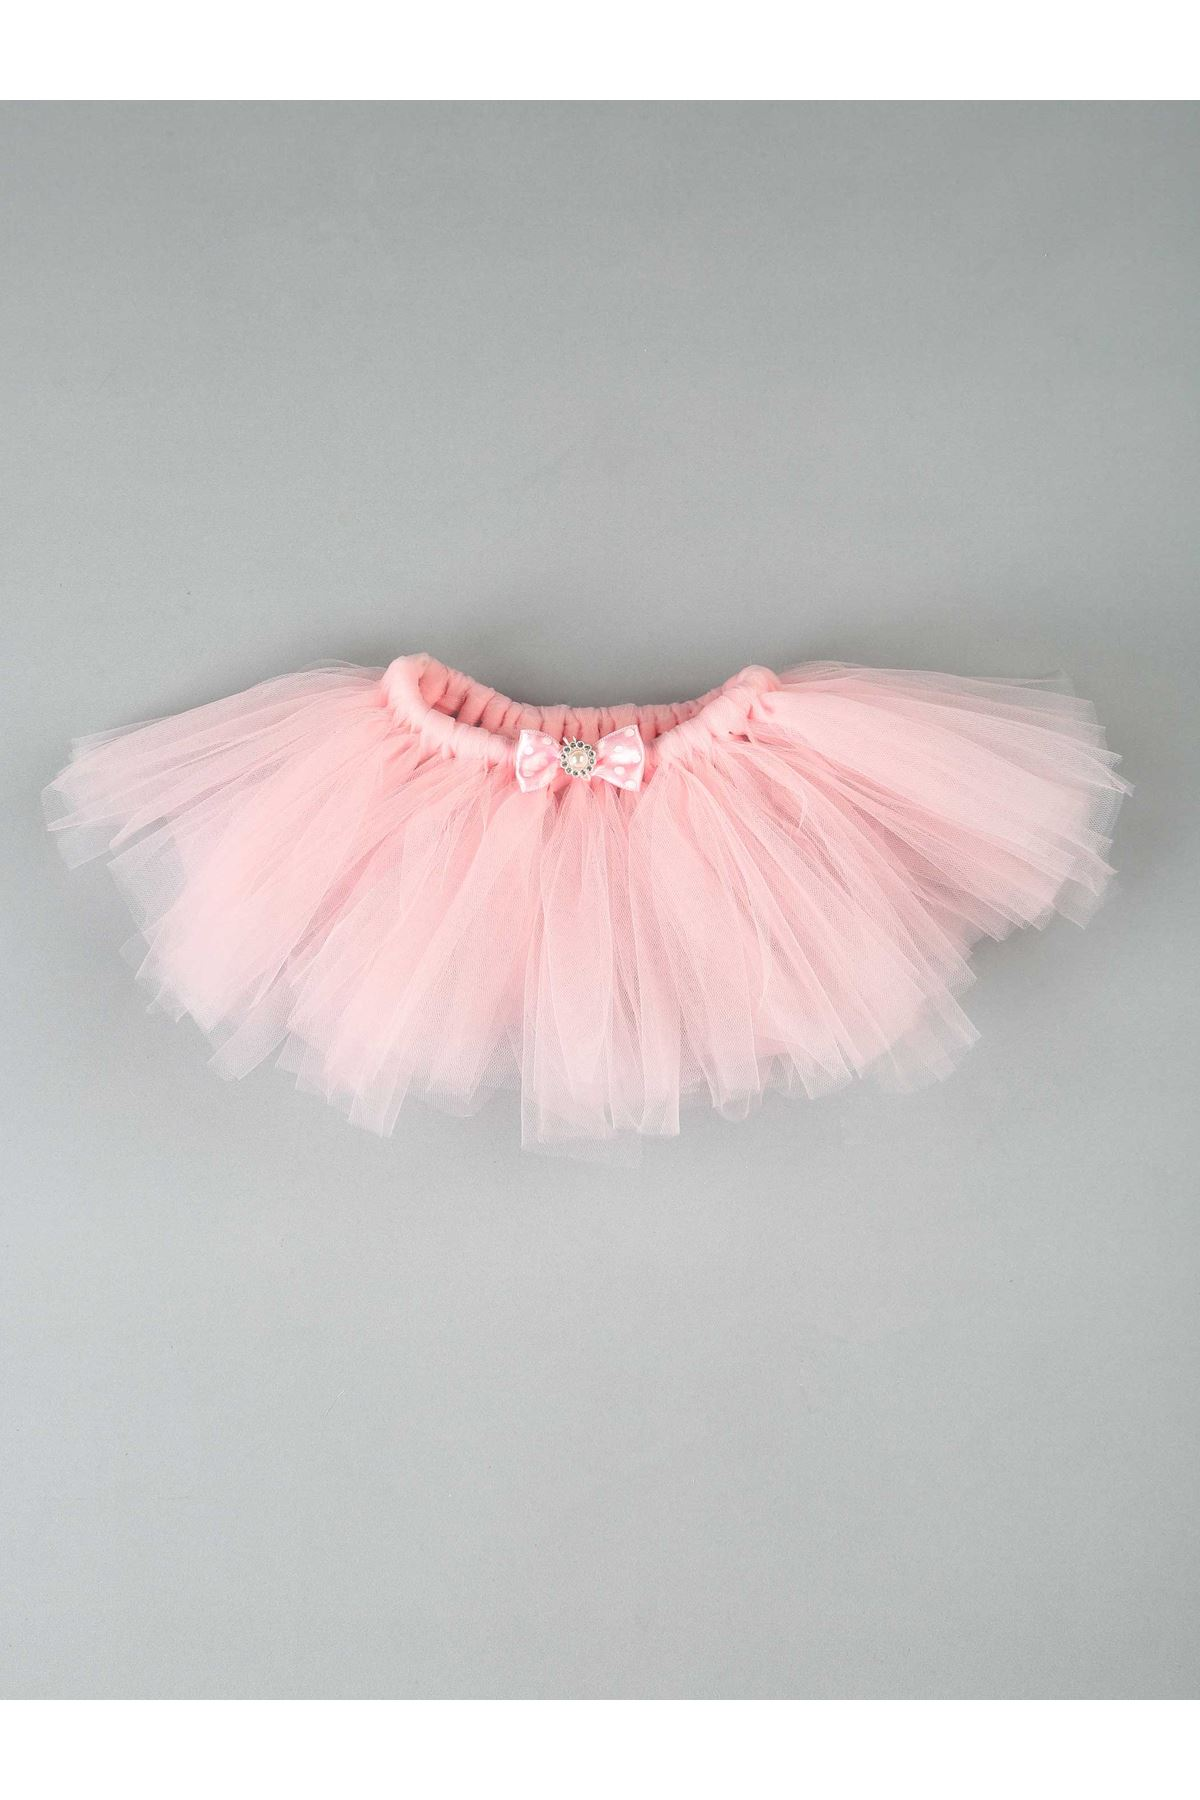 Pink 1 Age Baby Girl Tutu Suit